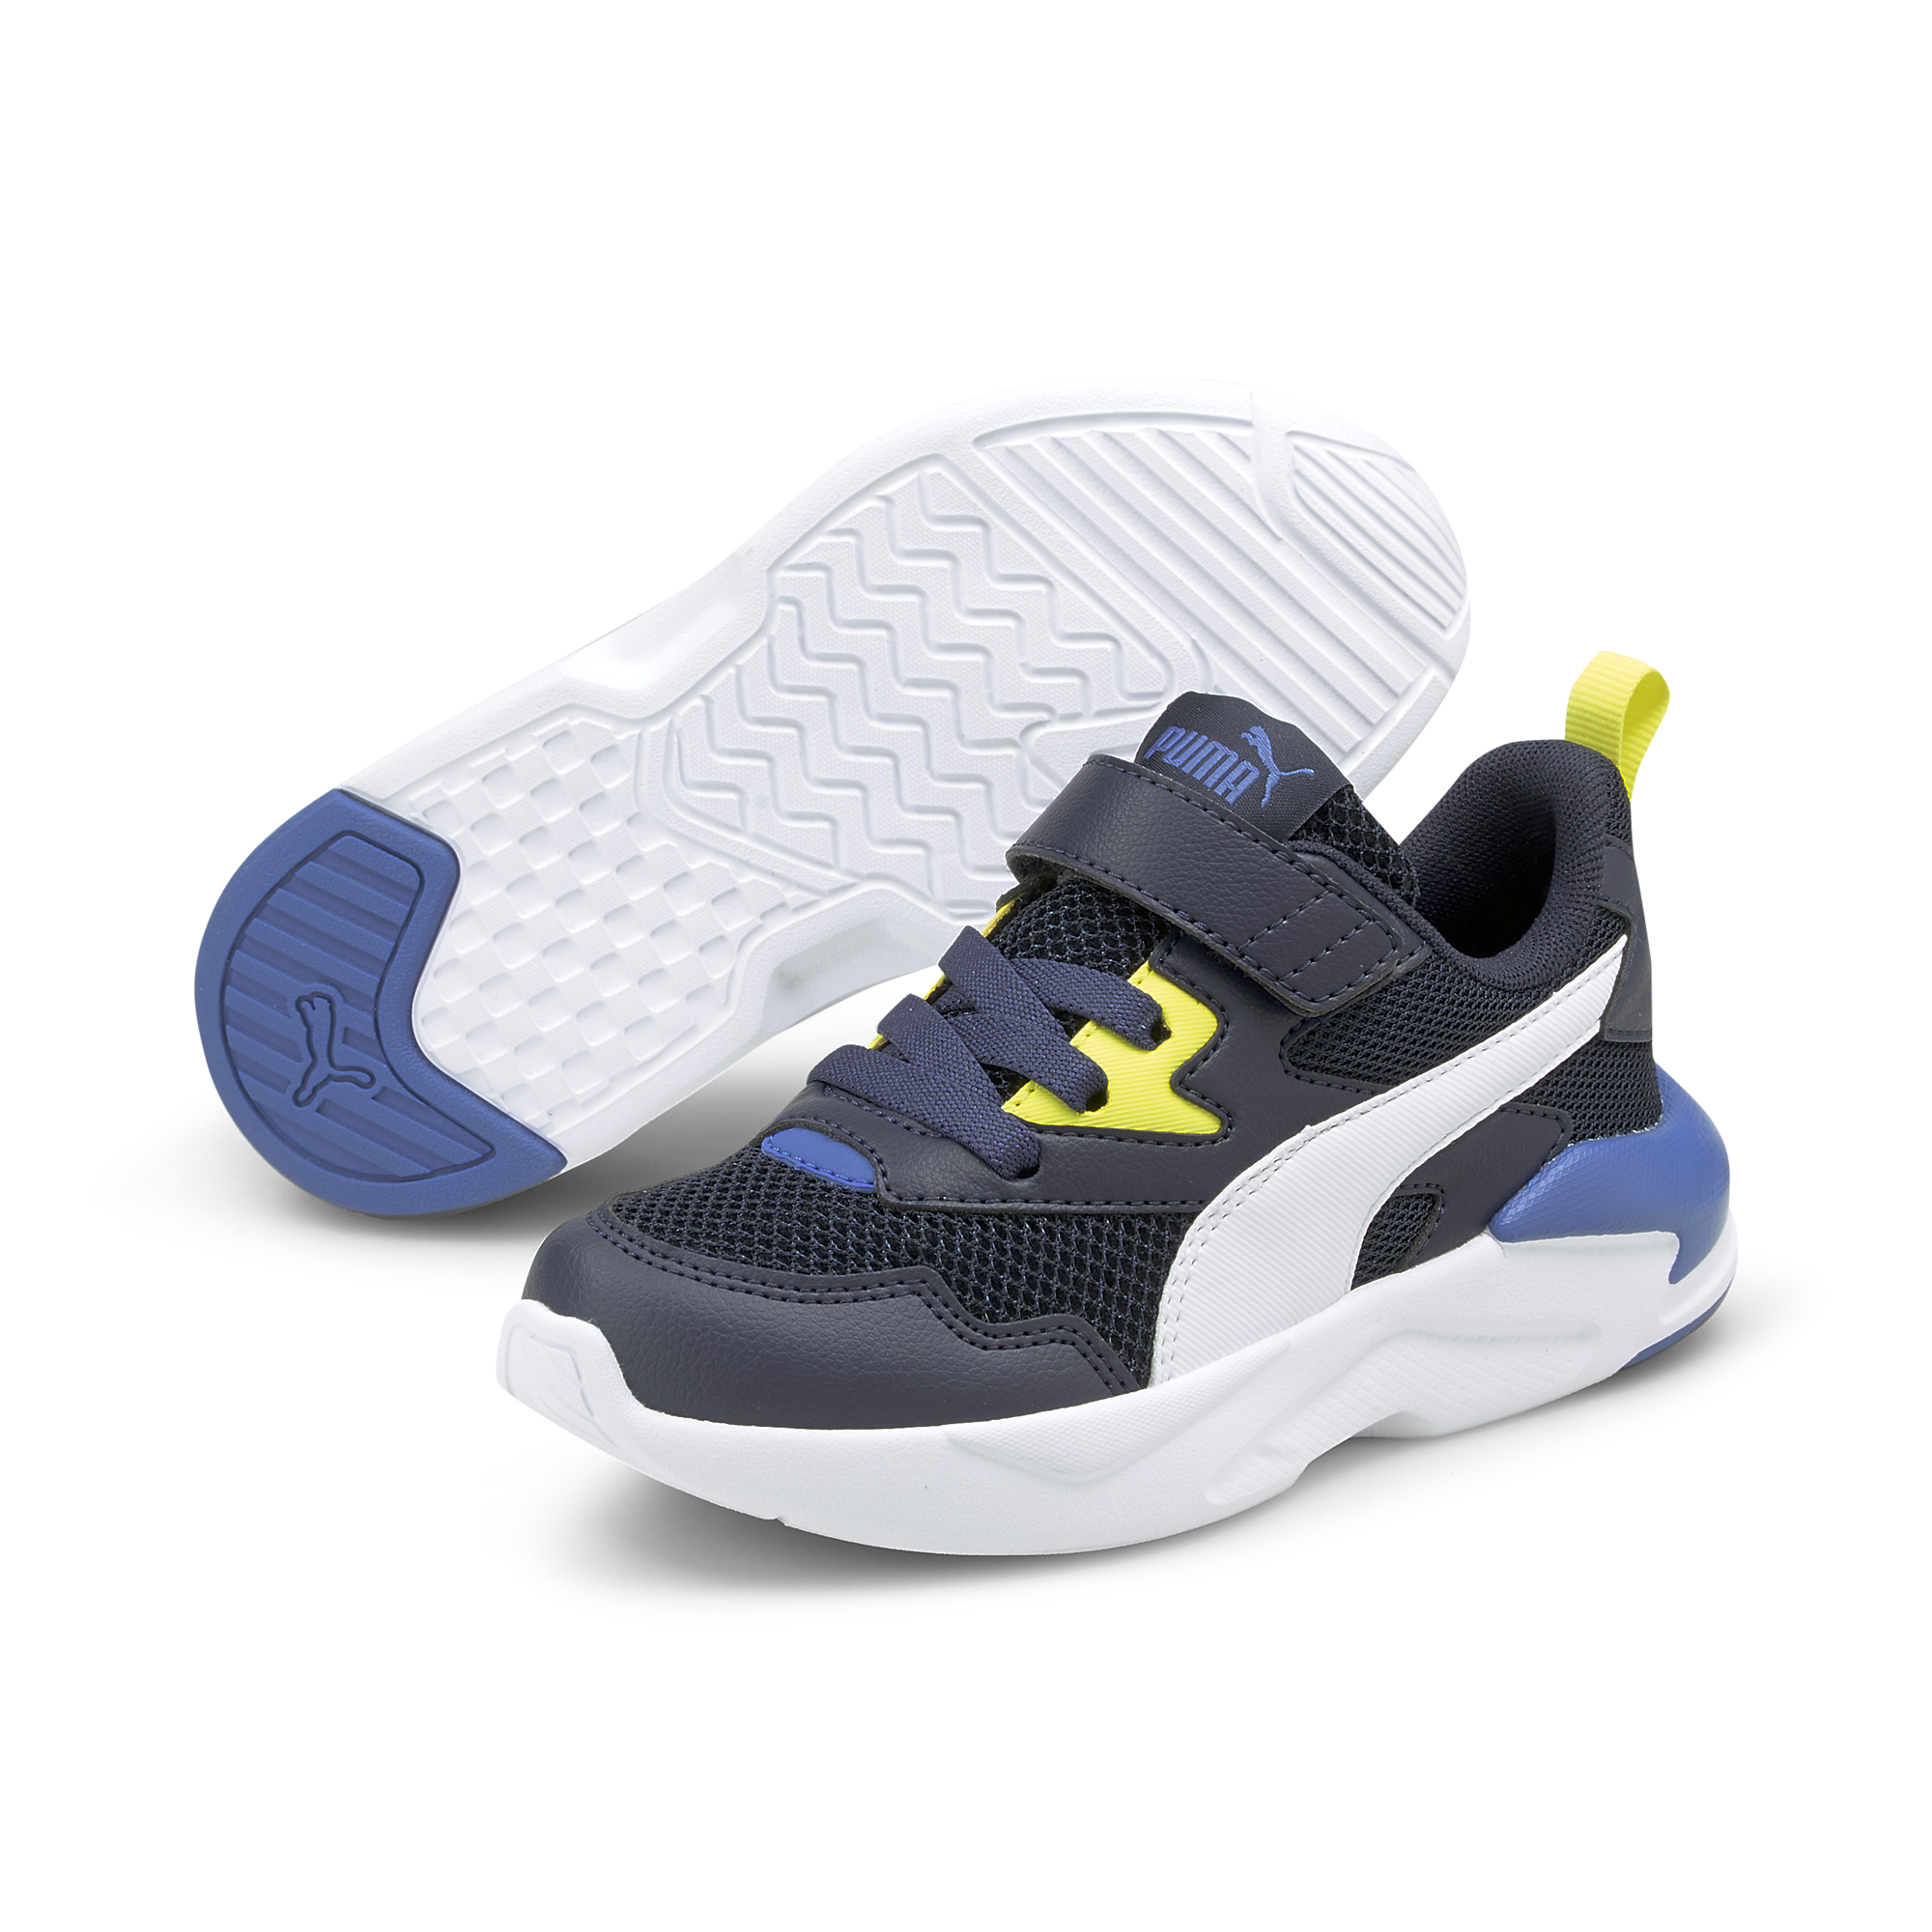 Puma X-Ray Lite kids sneakers